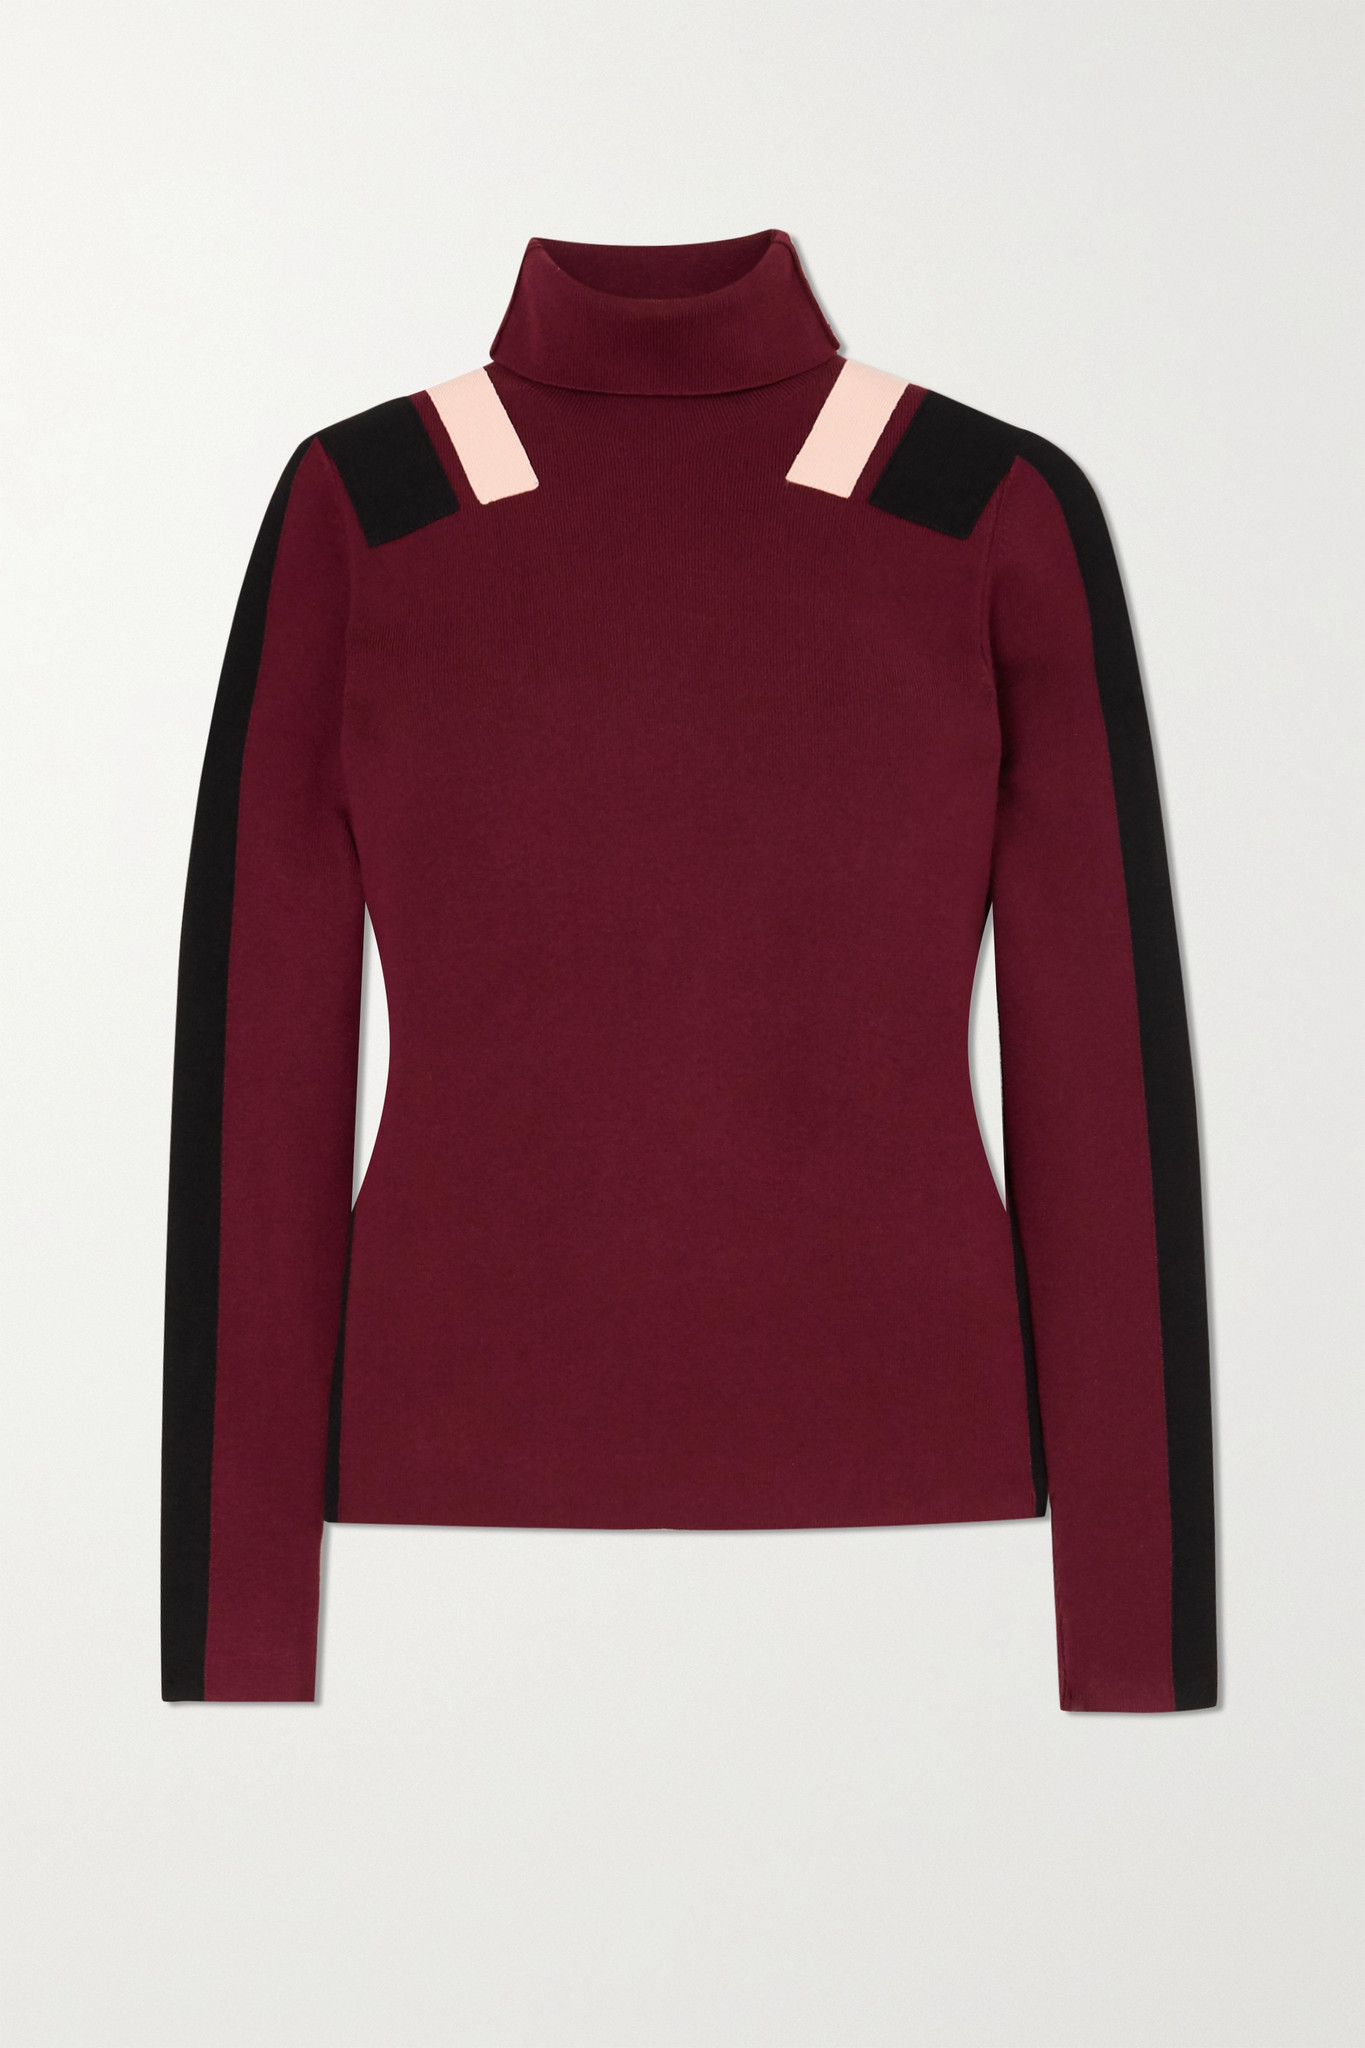 VICTORIA, VICTORIA BECKHAM - 拼色针织高领毛衣 - 酒红色 - medium